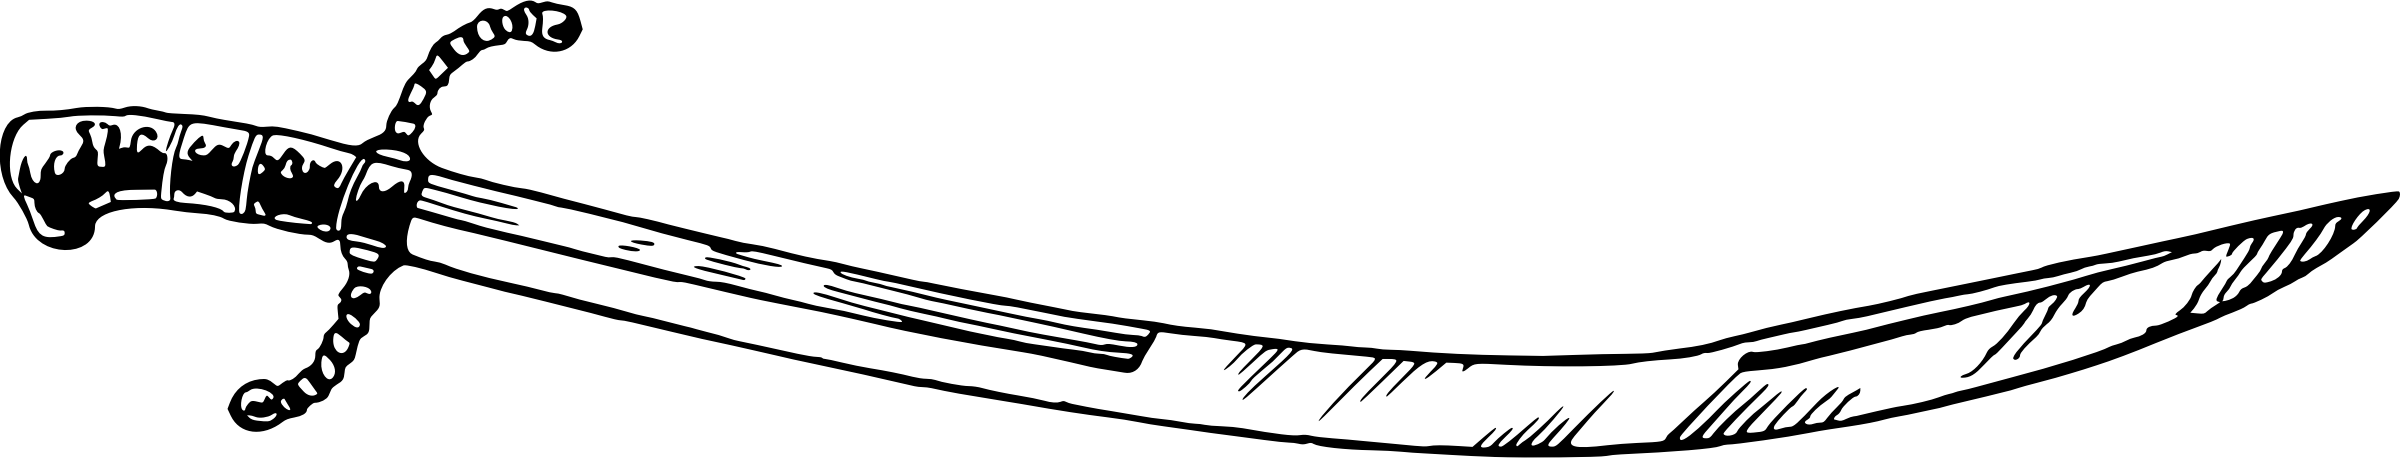 Sabre Sword vector clipart image.